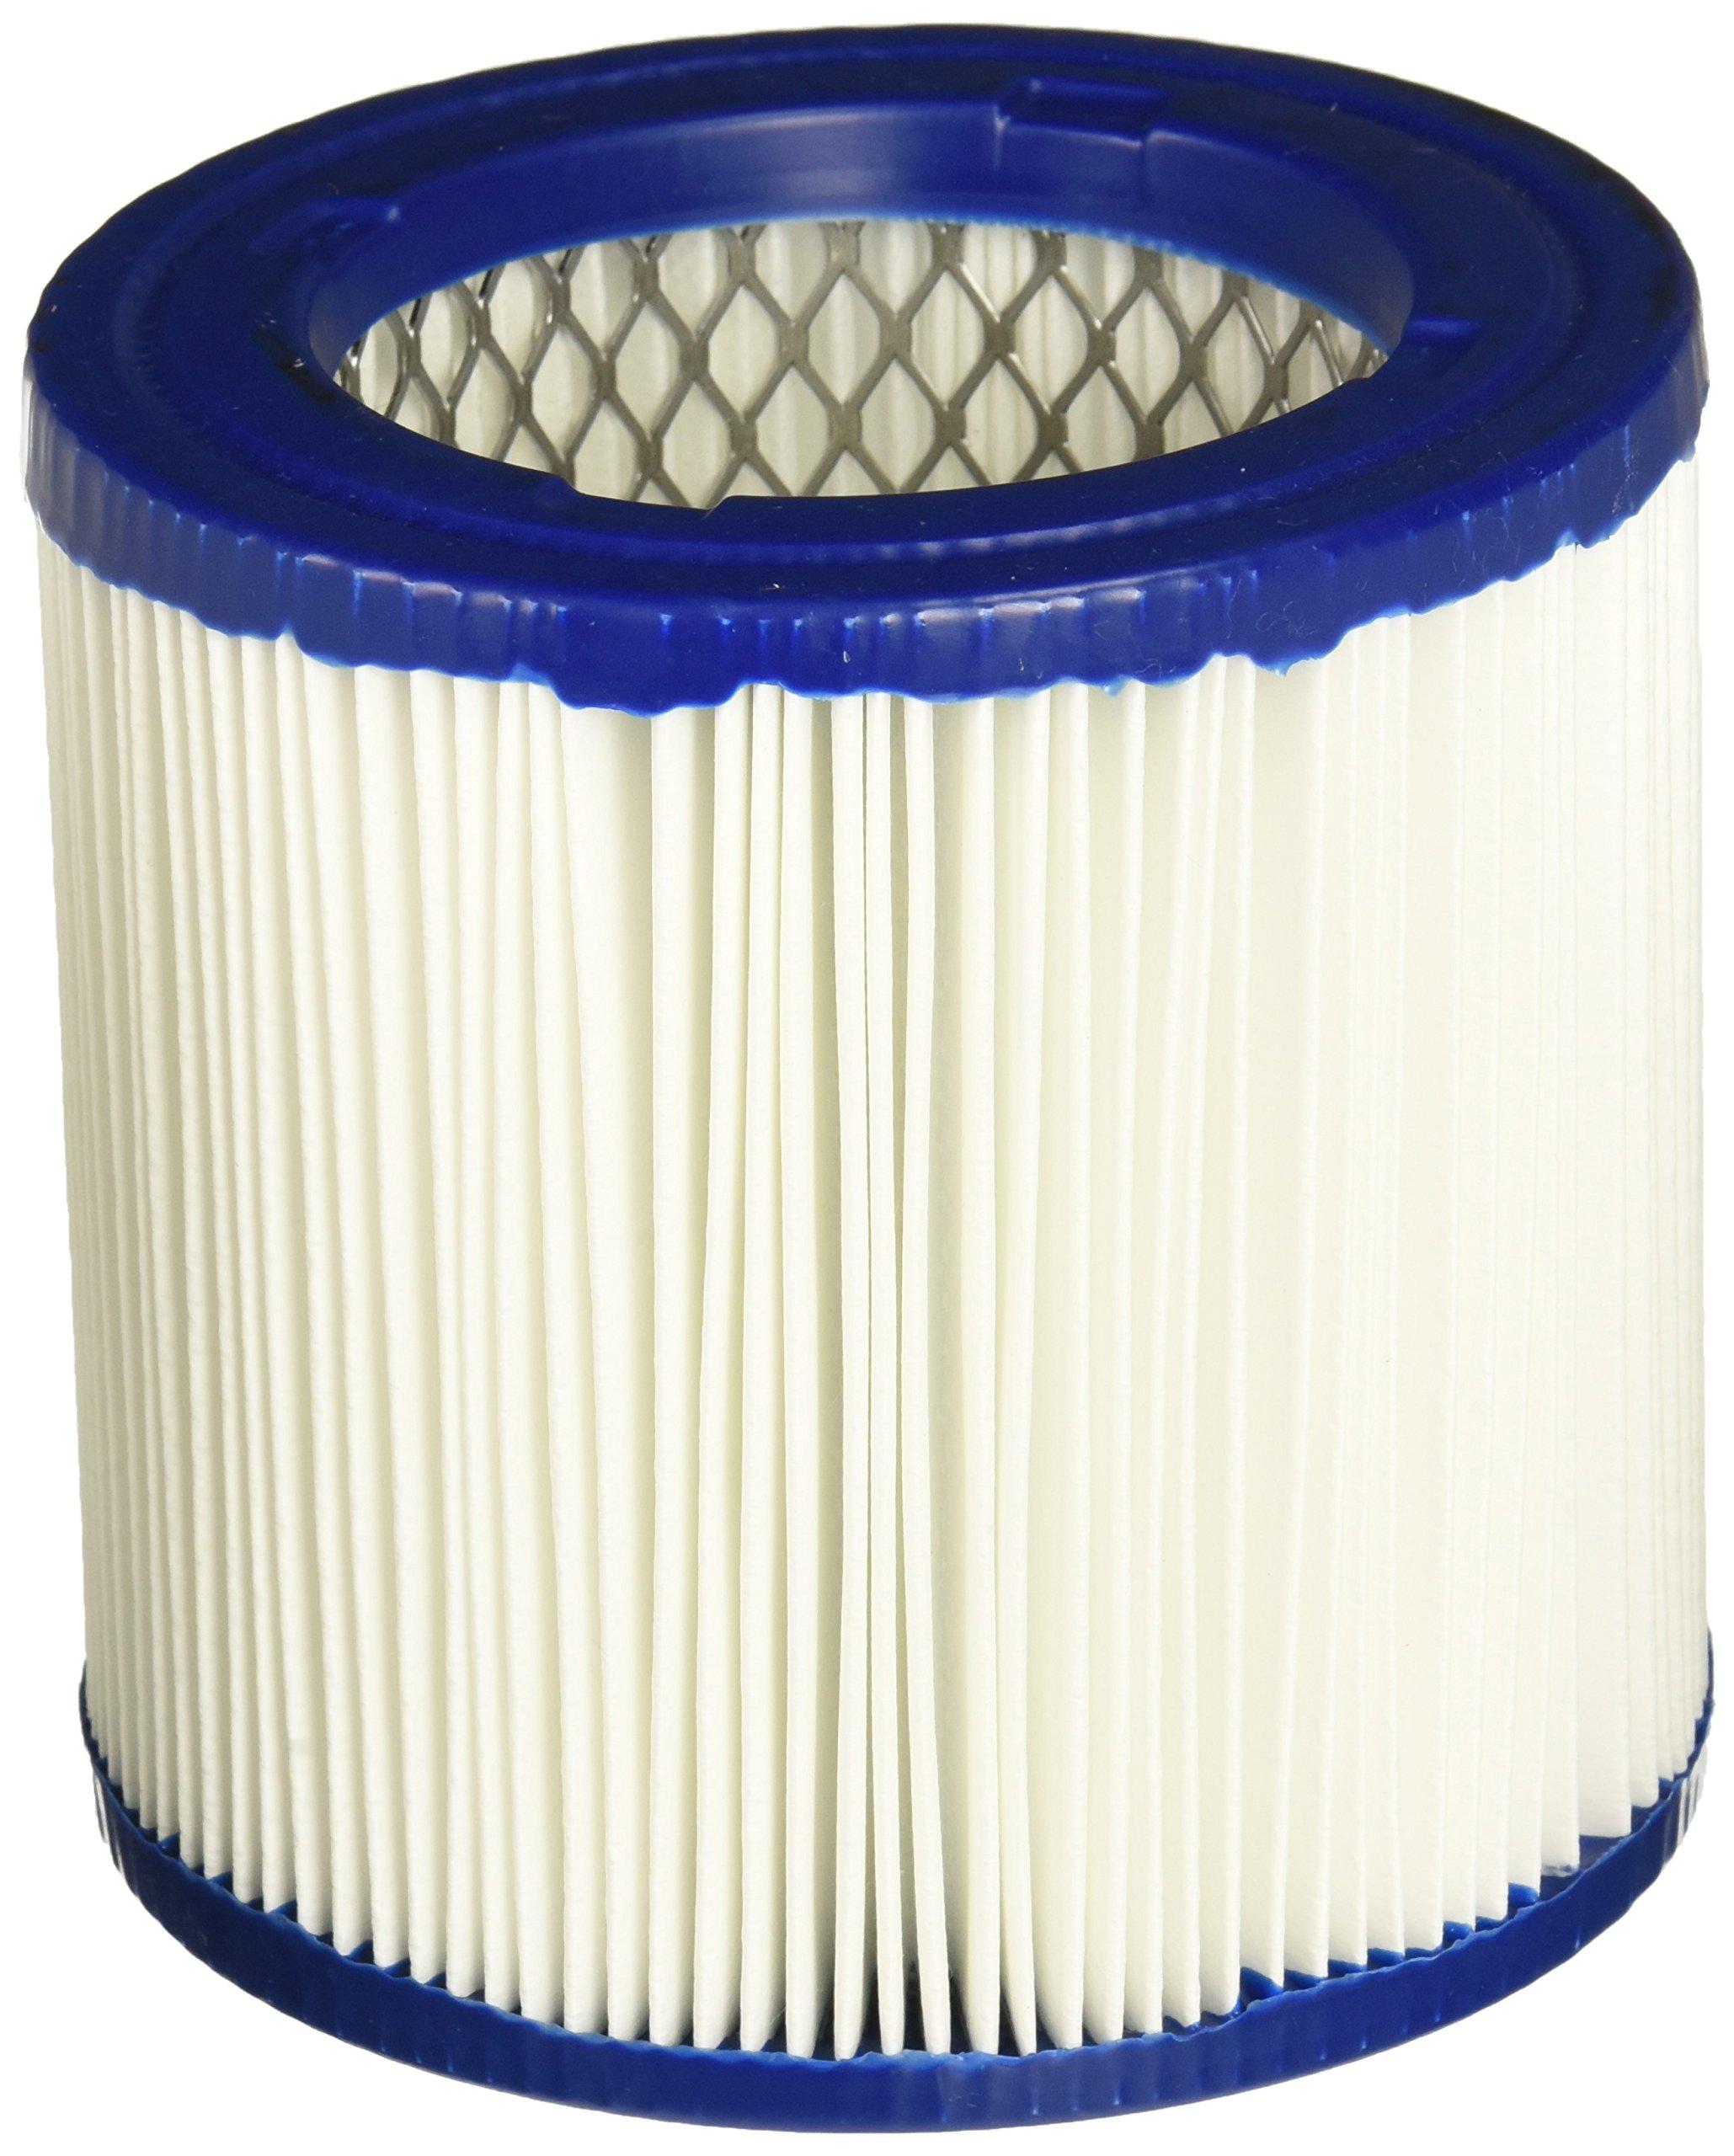 Shop-Vac 9032900 Ash Vacuum Cartridge Filter, Small, White